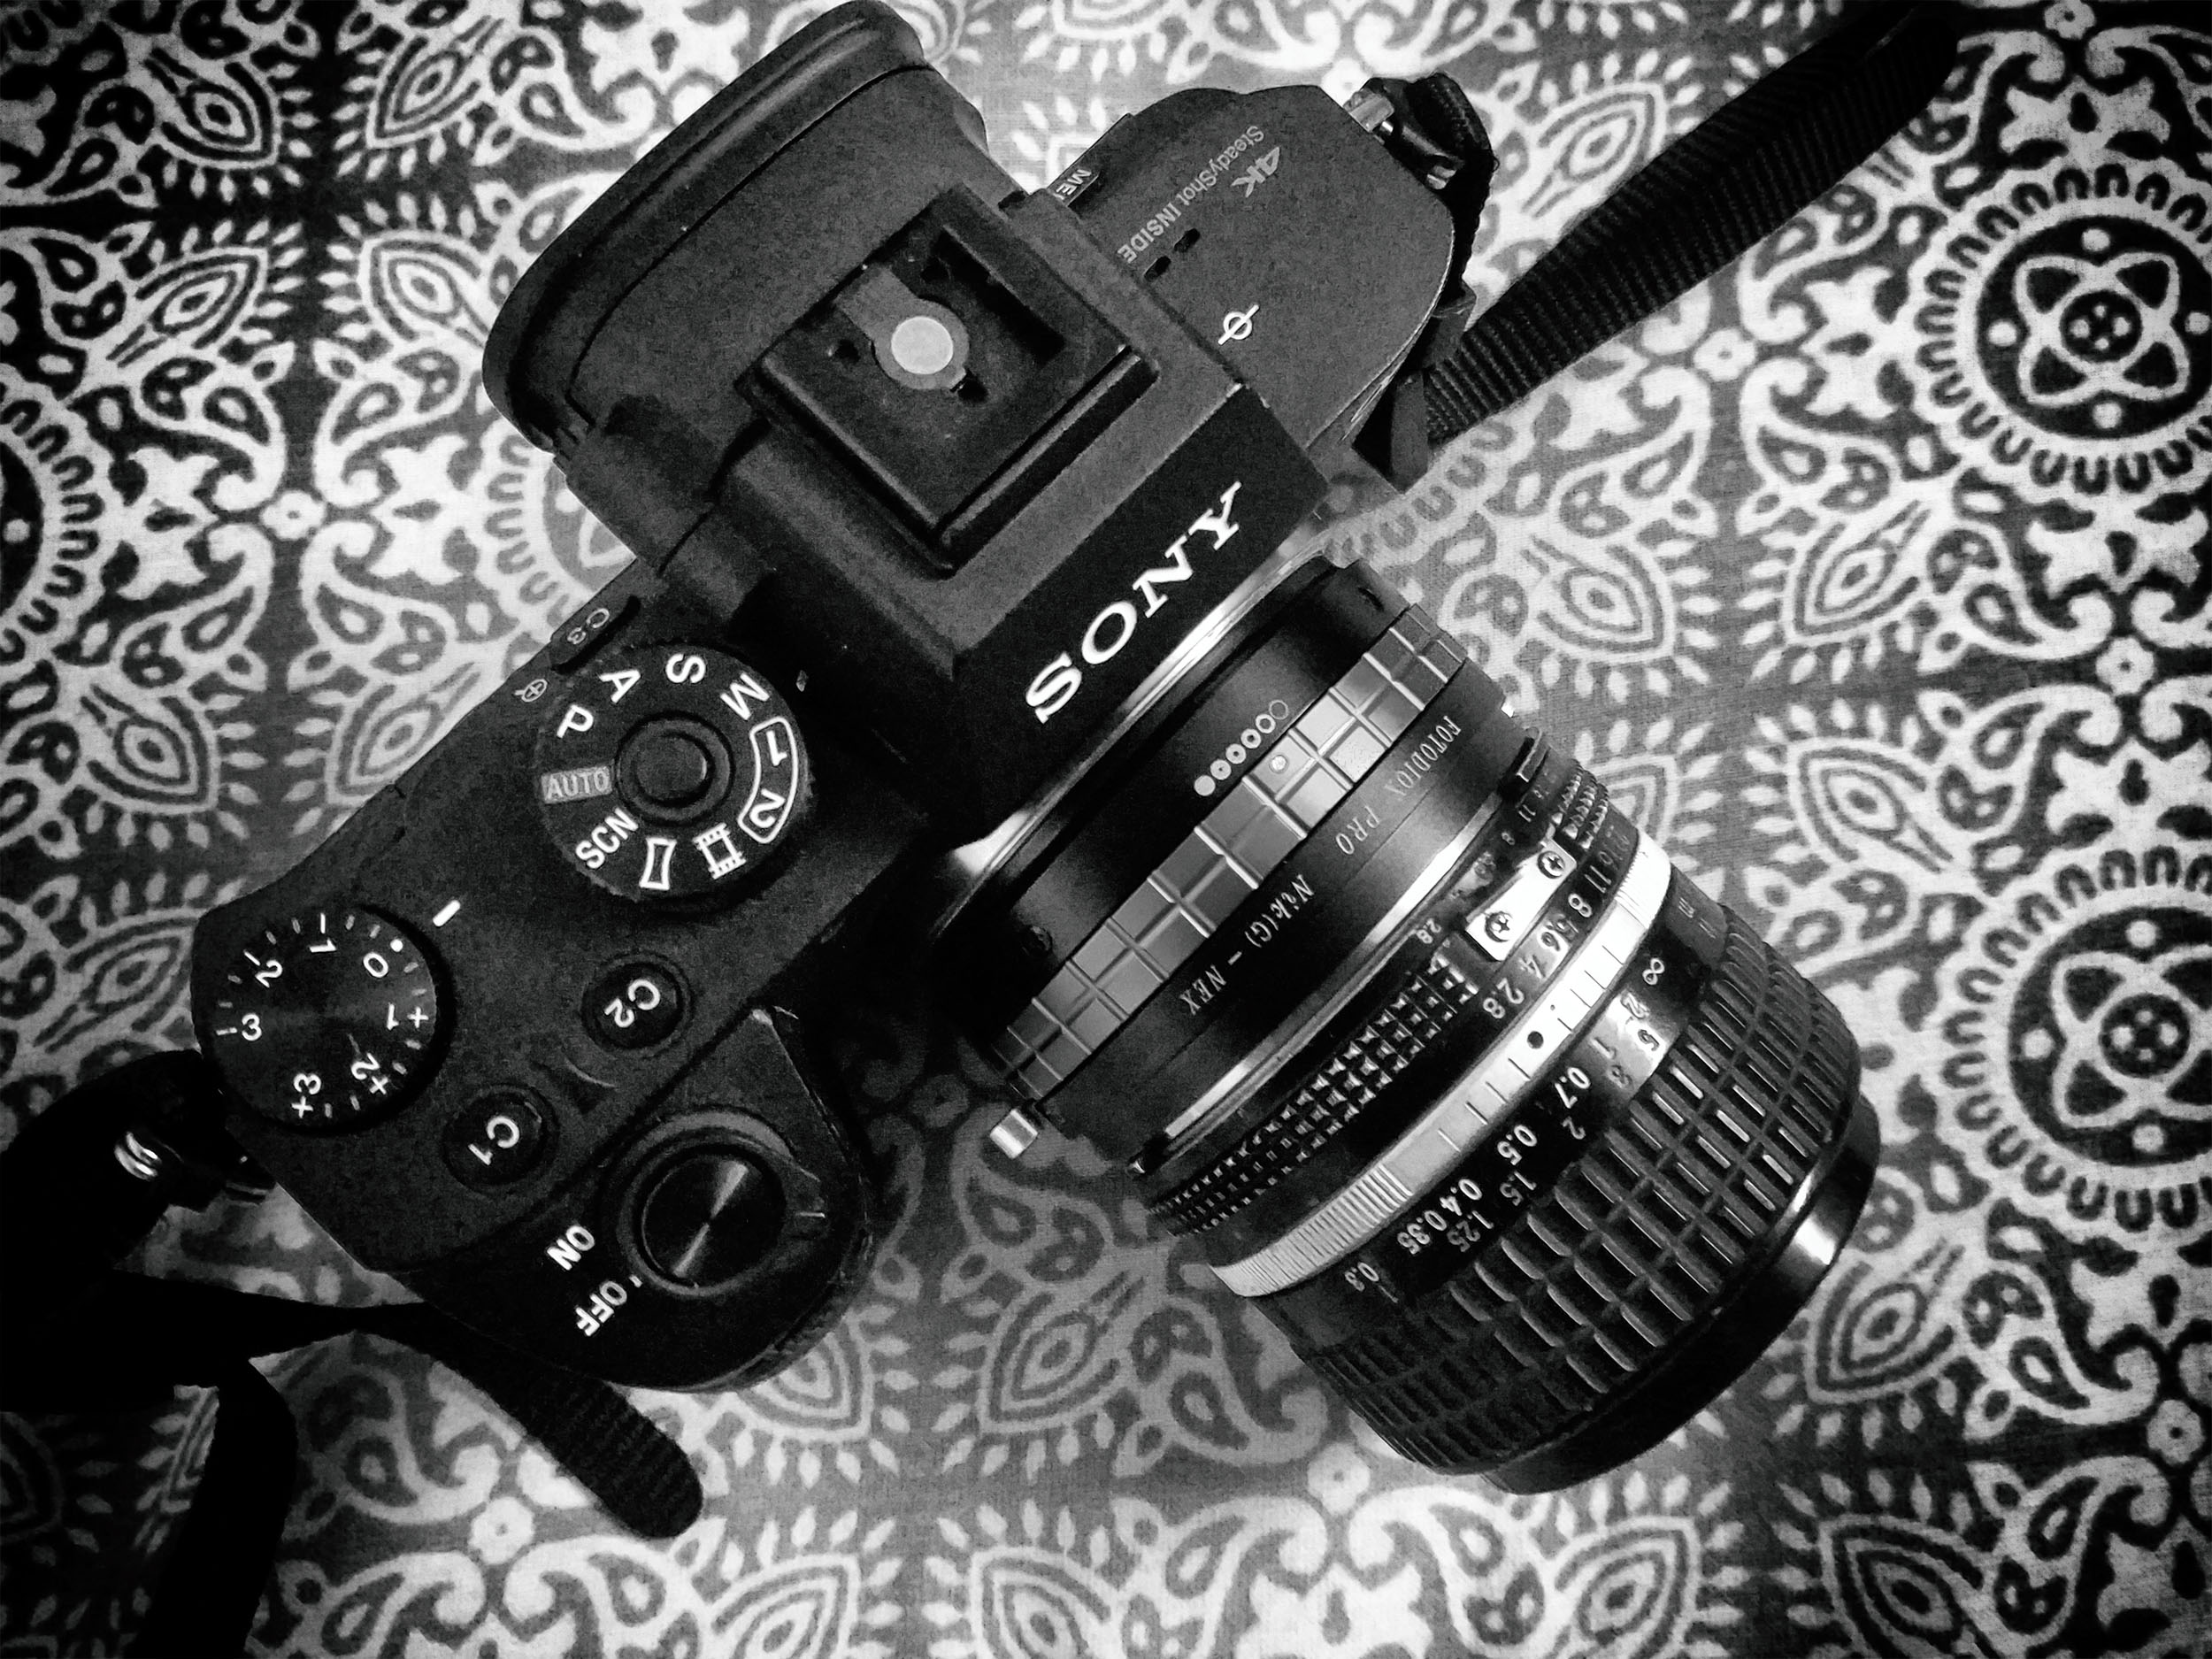 Nikon 24mm f/2.8 AIS lens mounted on Sony A7R II with Fotodiox Nik(G) to NEX adaptor